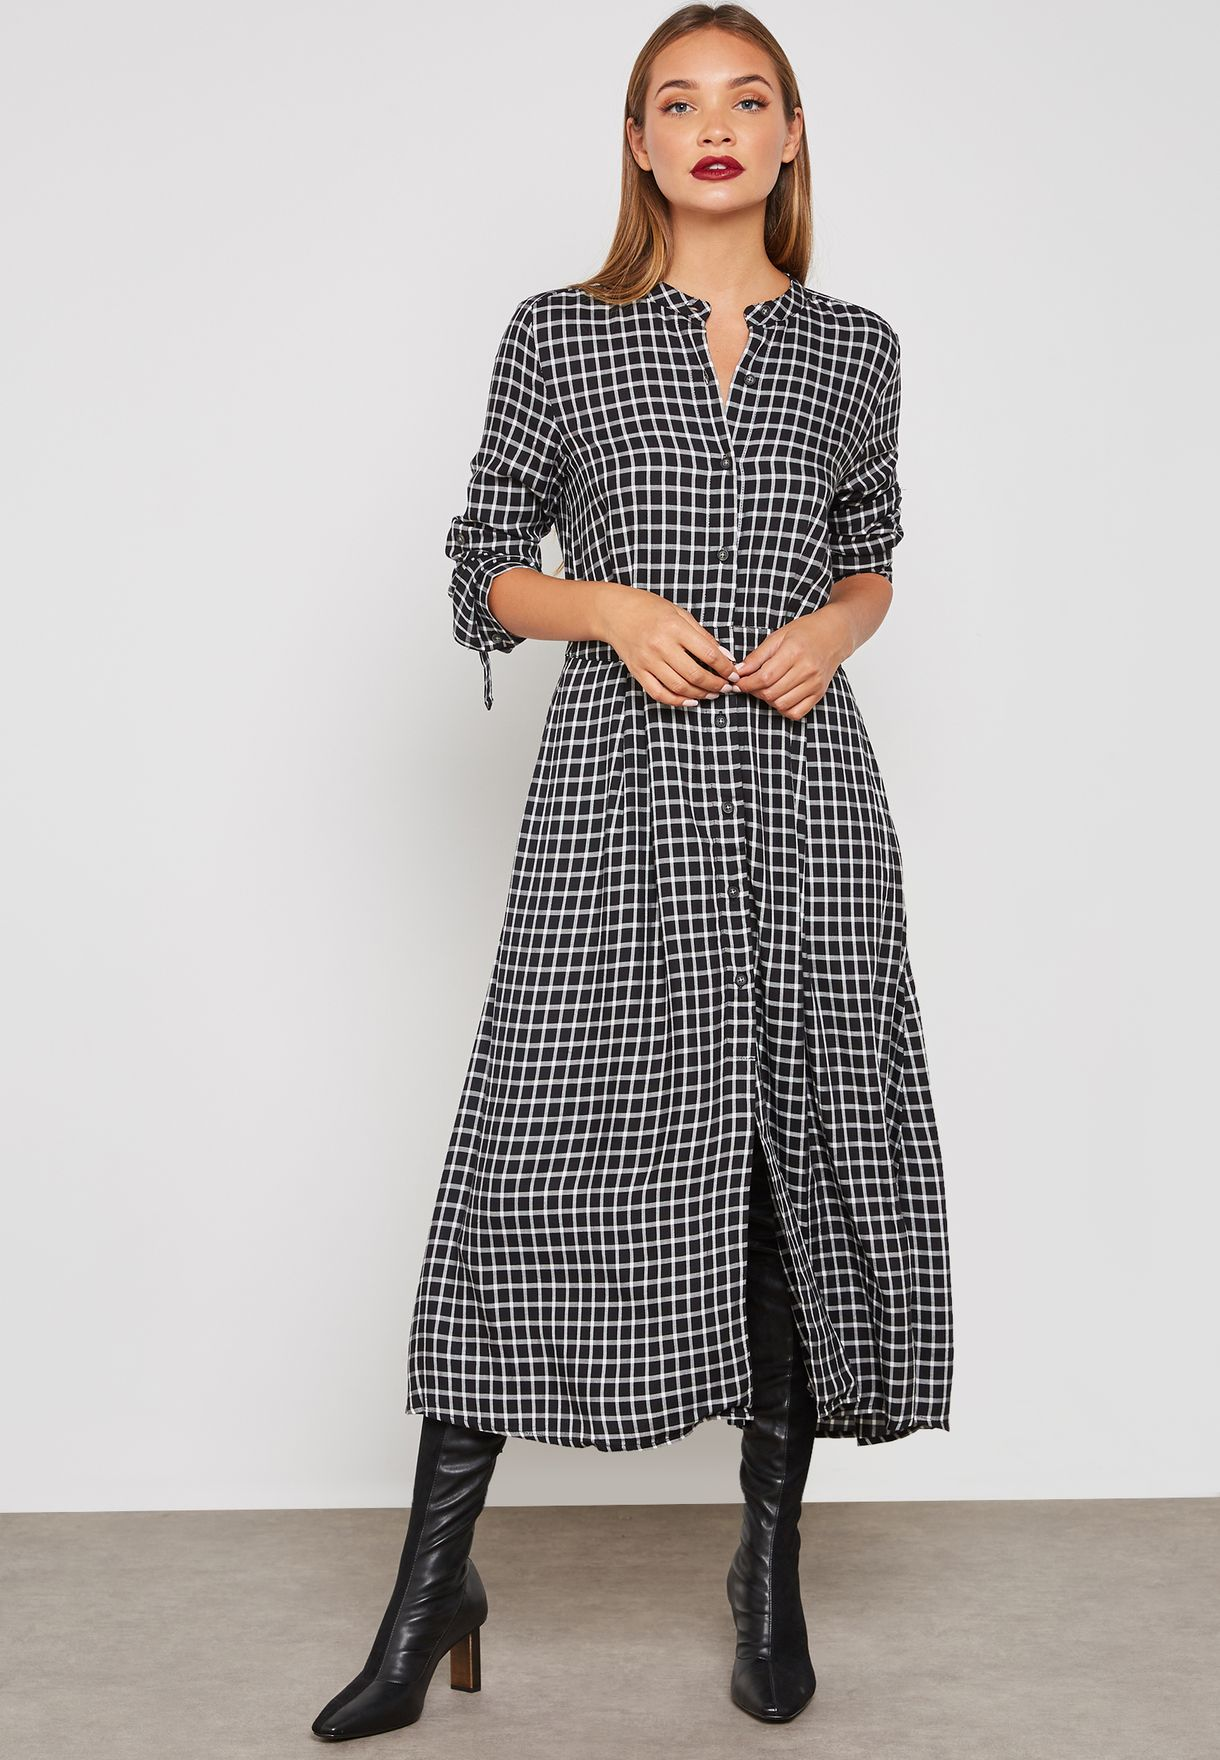 bd6702cf01 Shop Mango prints Gingham Shirt Dress 33027667 for Women in UAE ...